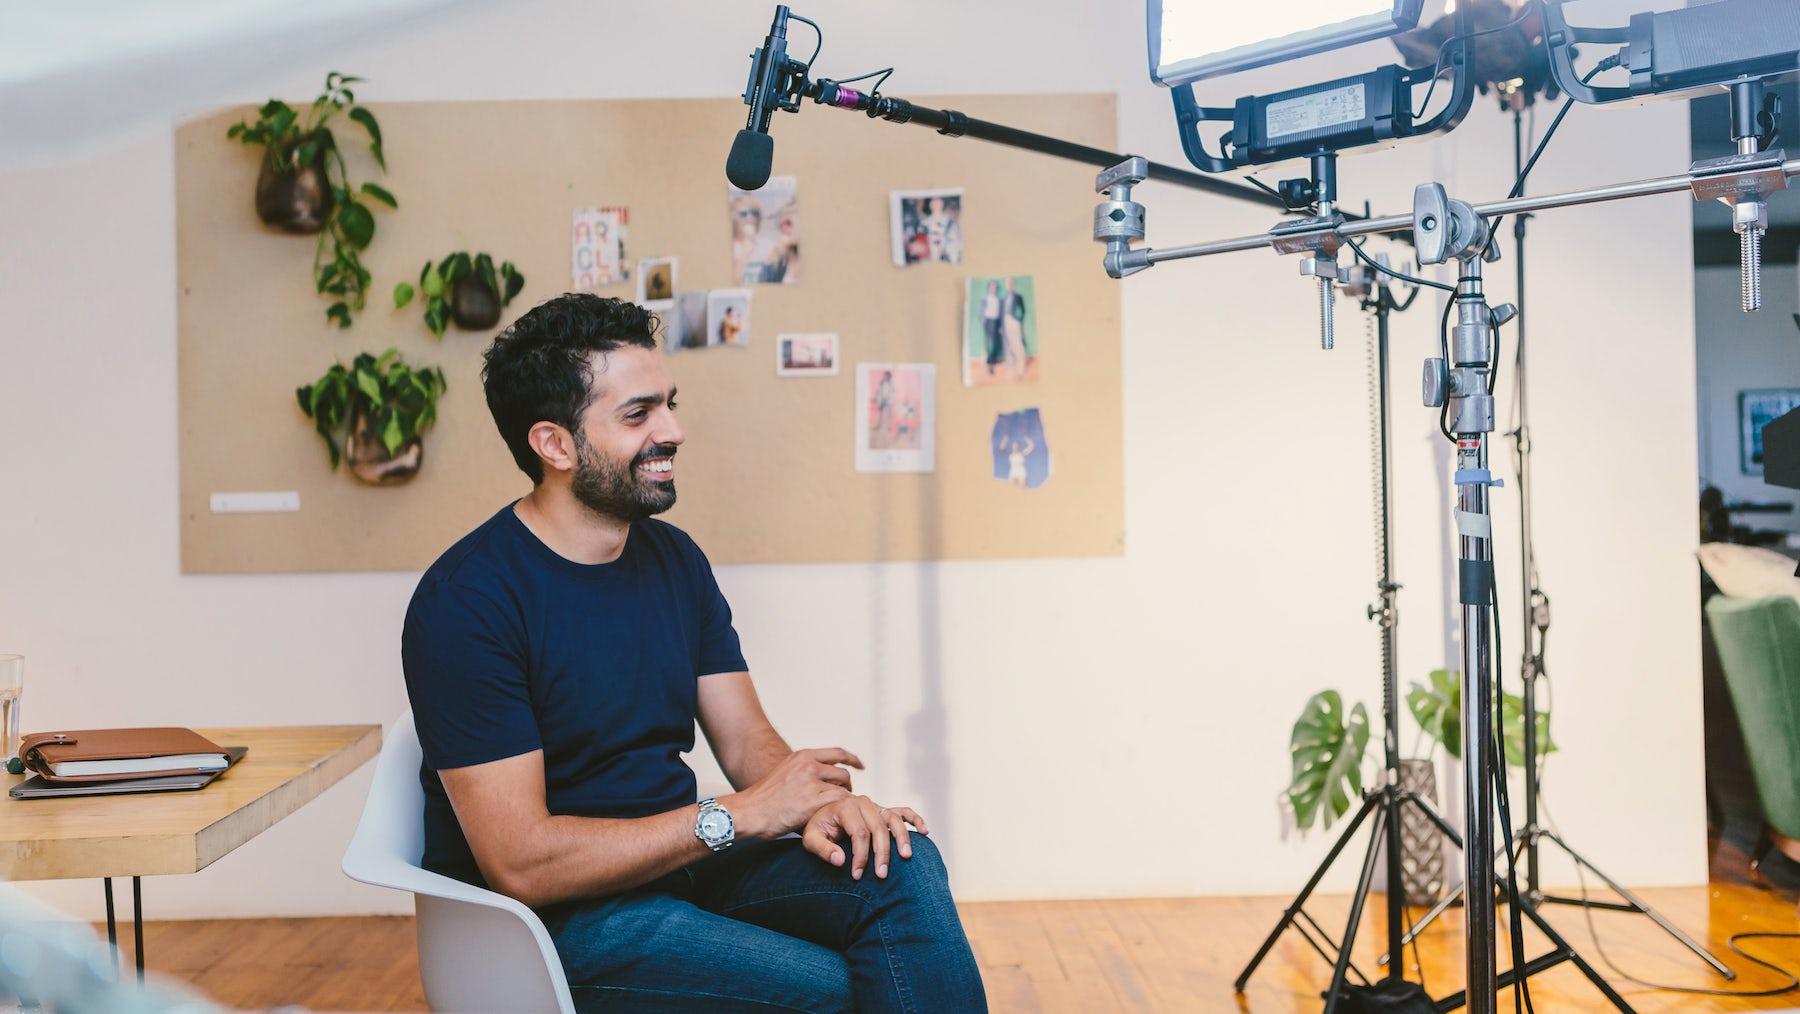 Musa Tariq on set | Source: BoF